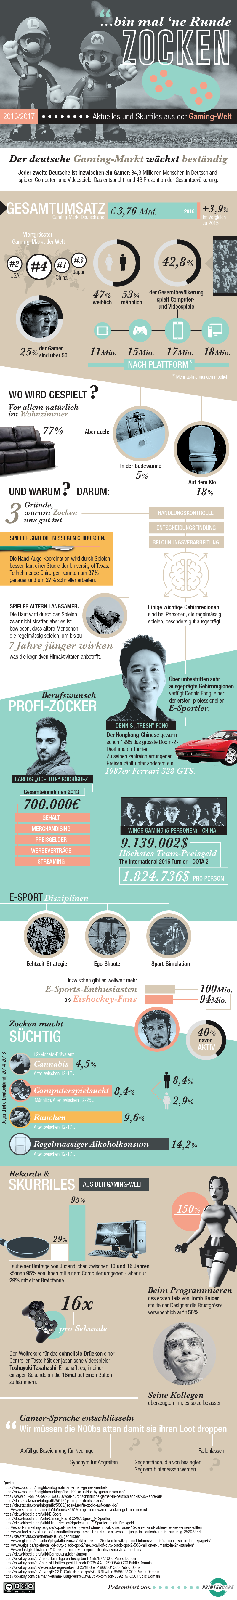 Infografik - Bin mal ne Runde zocken